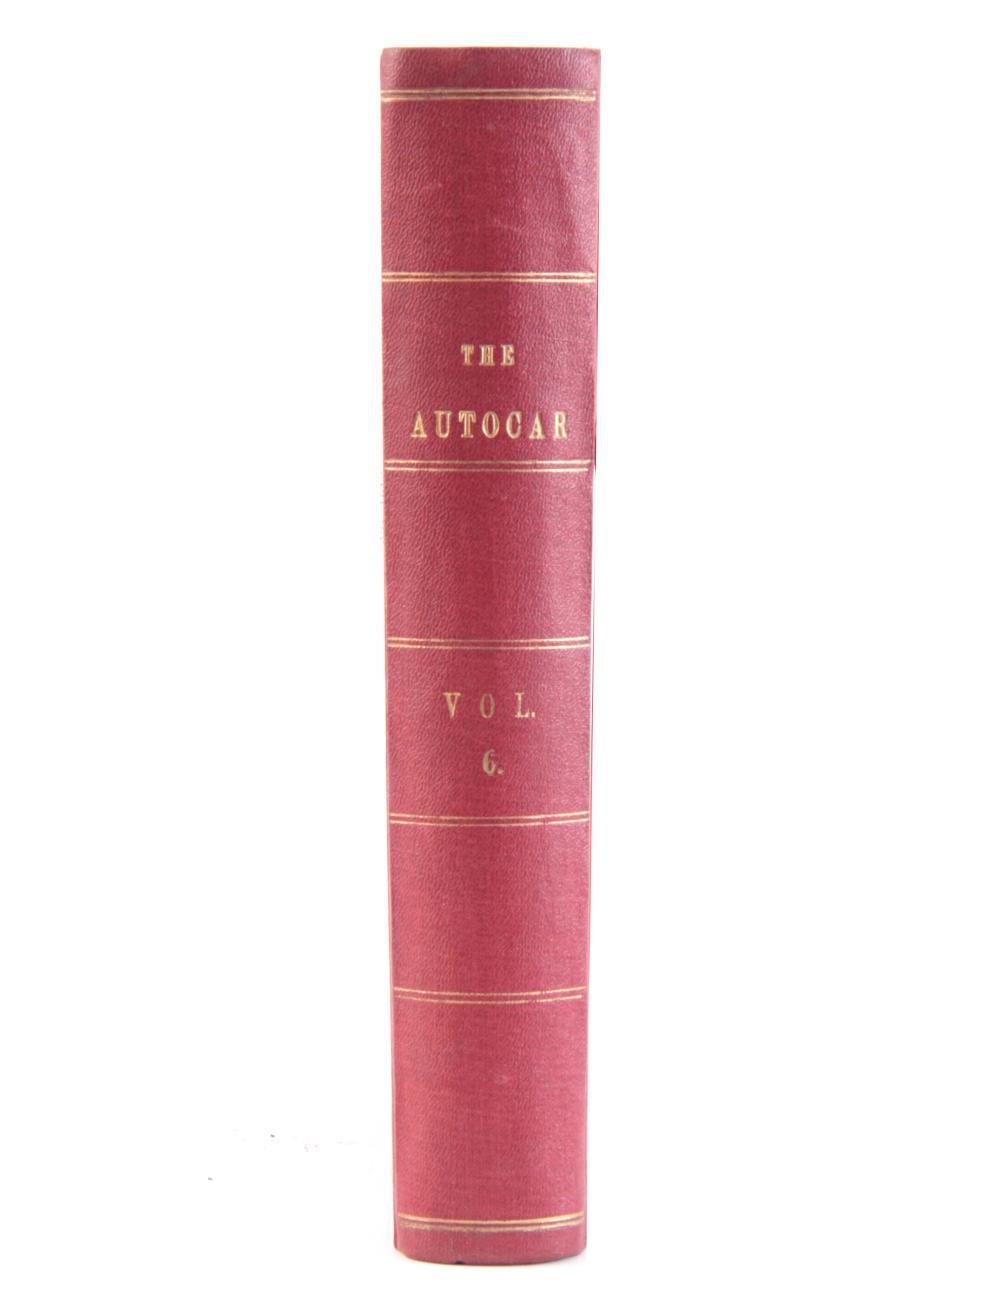 THE AUTOCAR 1901 VOLUME 6 by Henry Sturmey. (39)